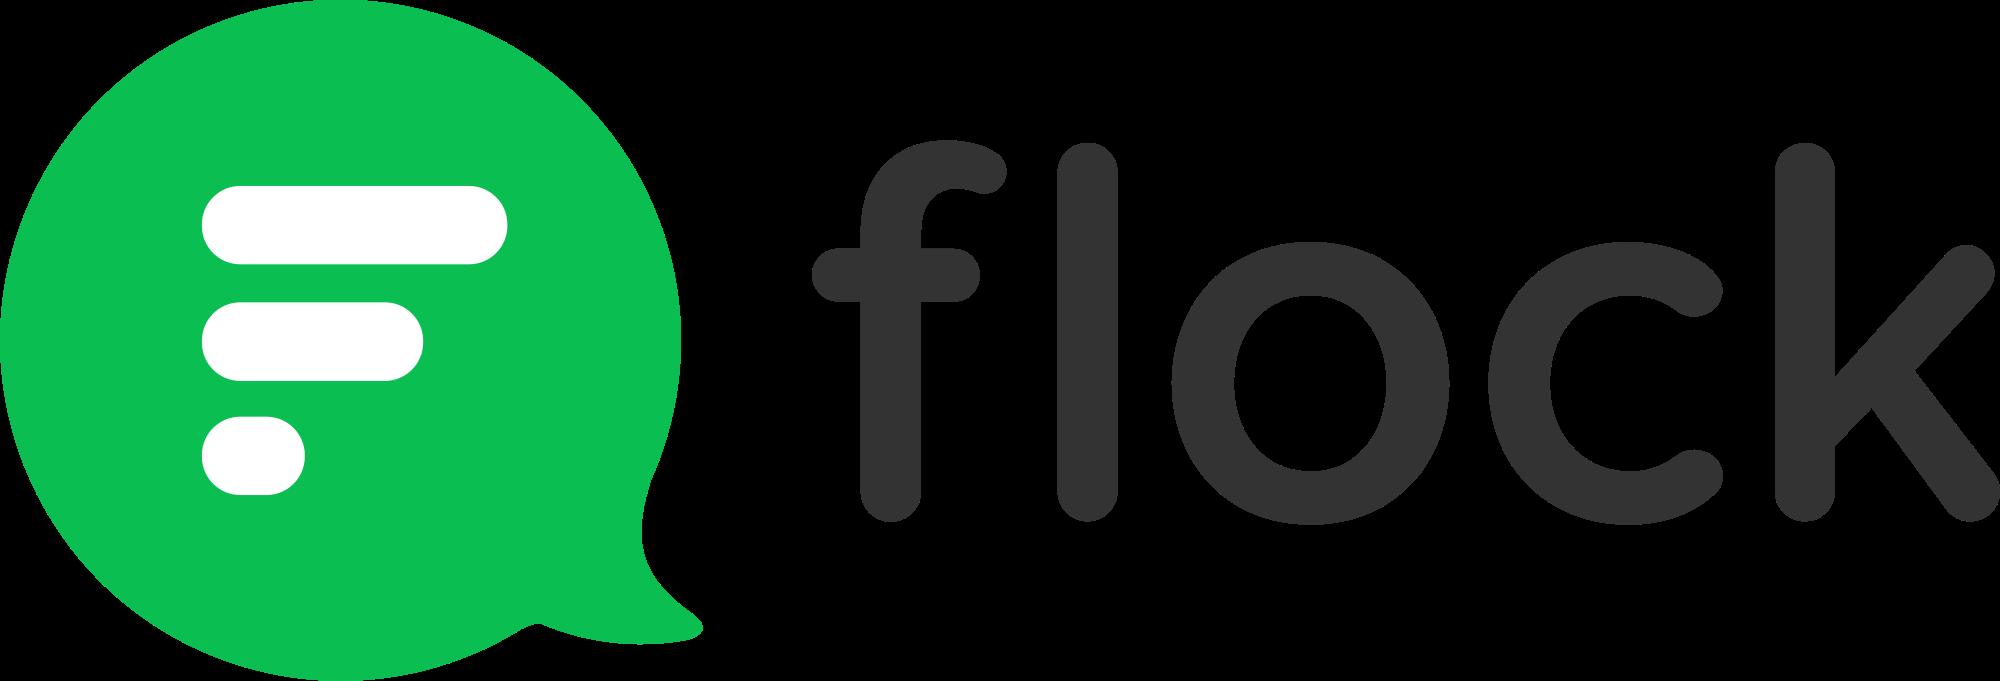 Flock logo